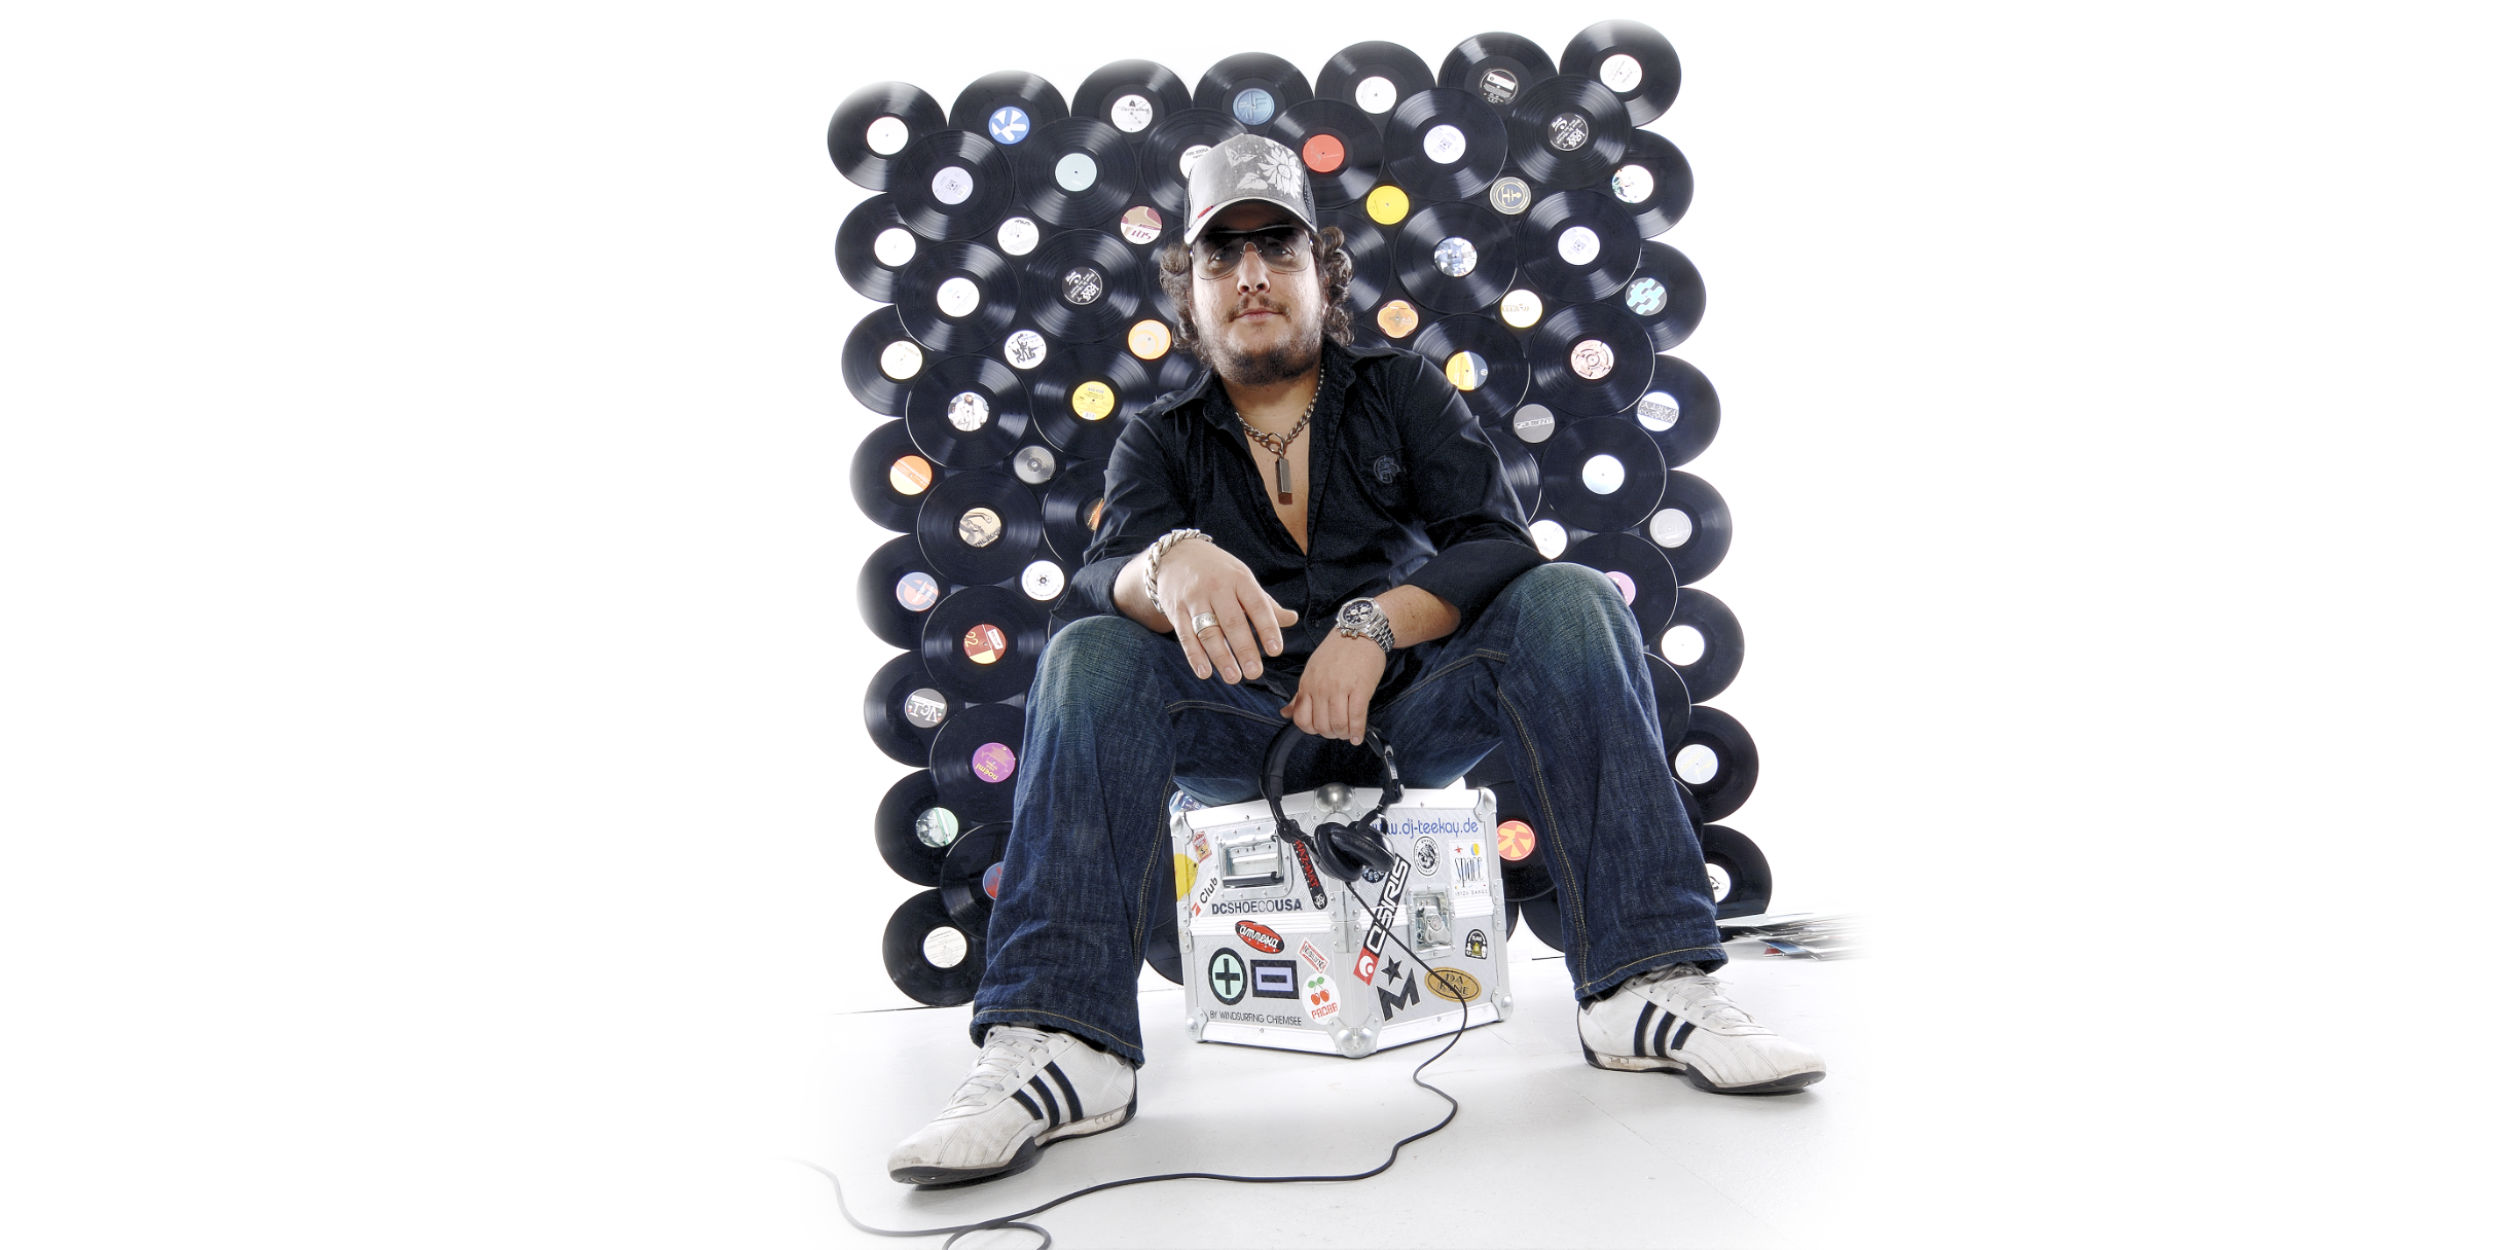 People Fotografie Stuttgart und Umgebung Charakter Portrait DJ Teekay Platten Promo Cover